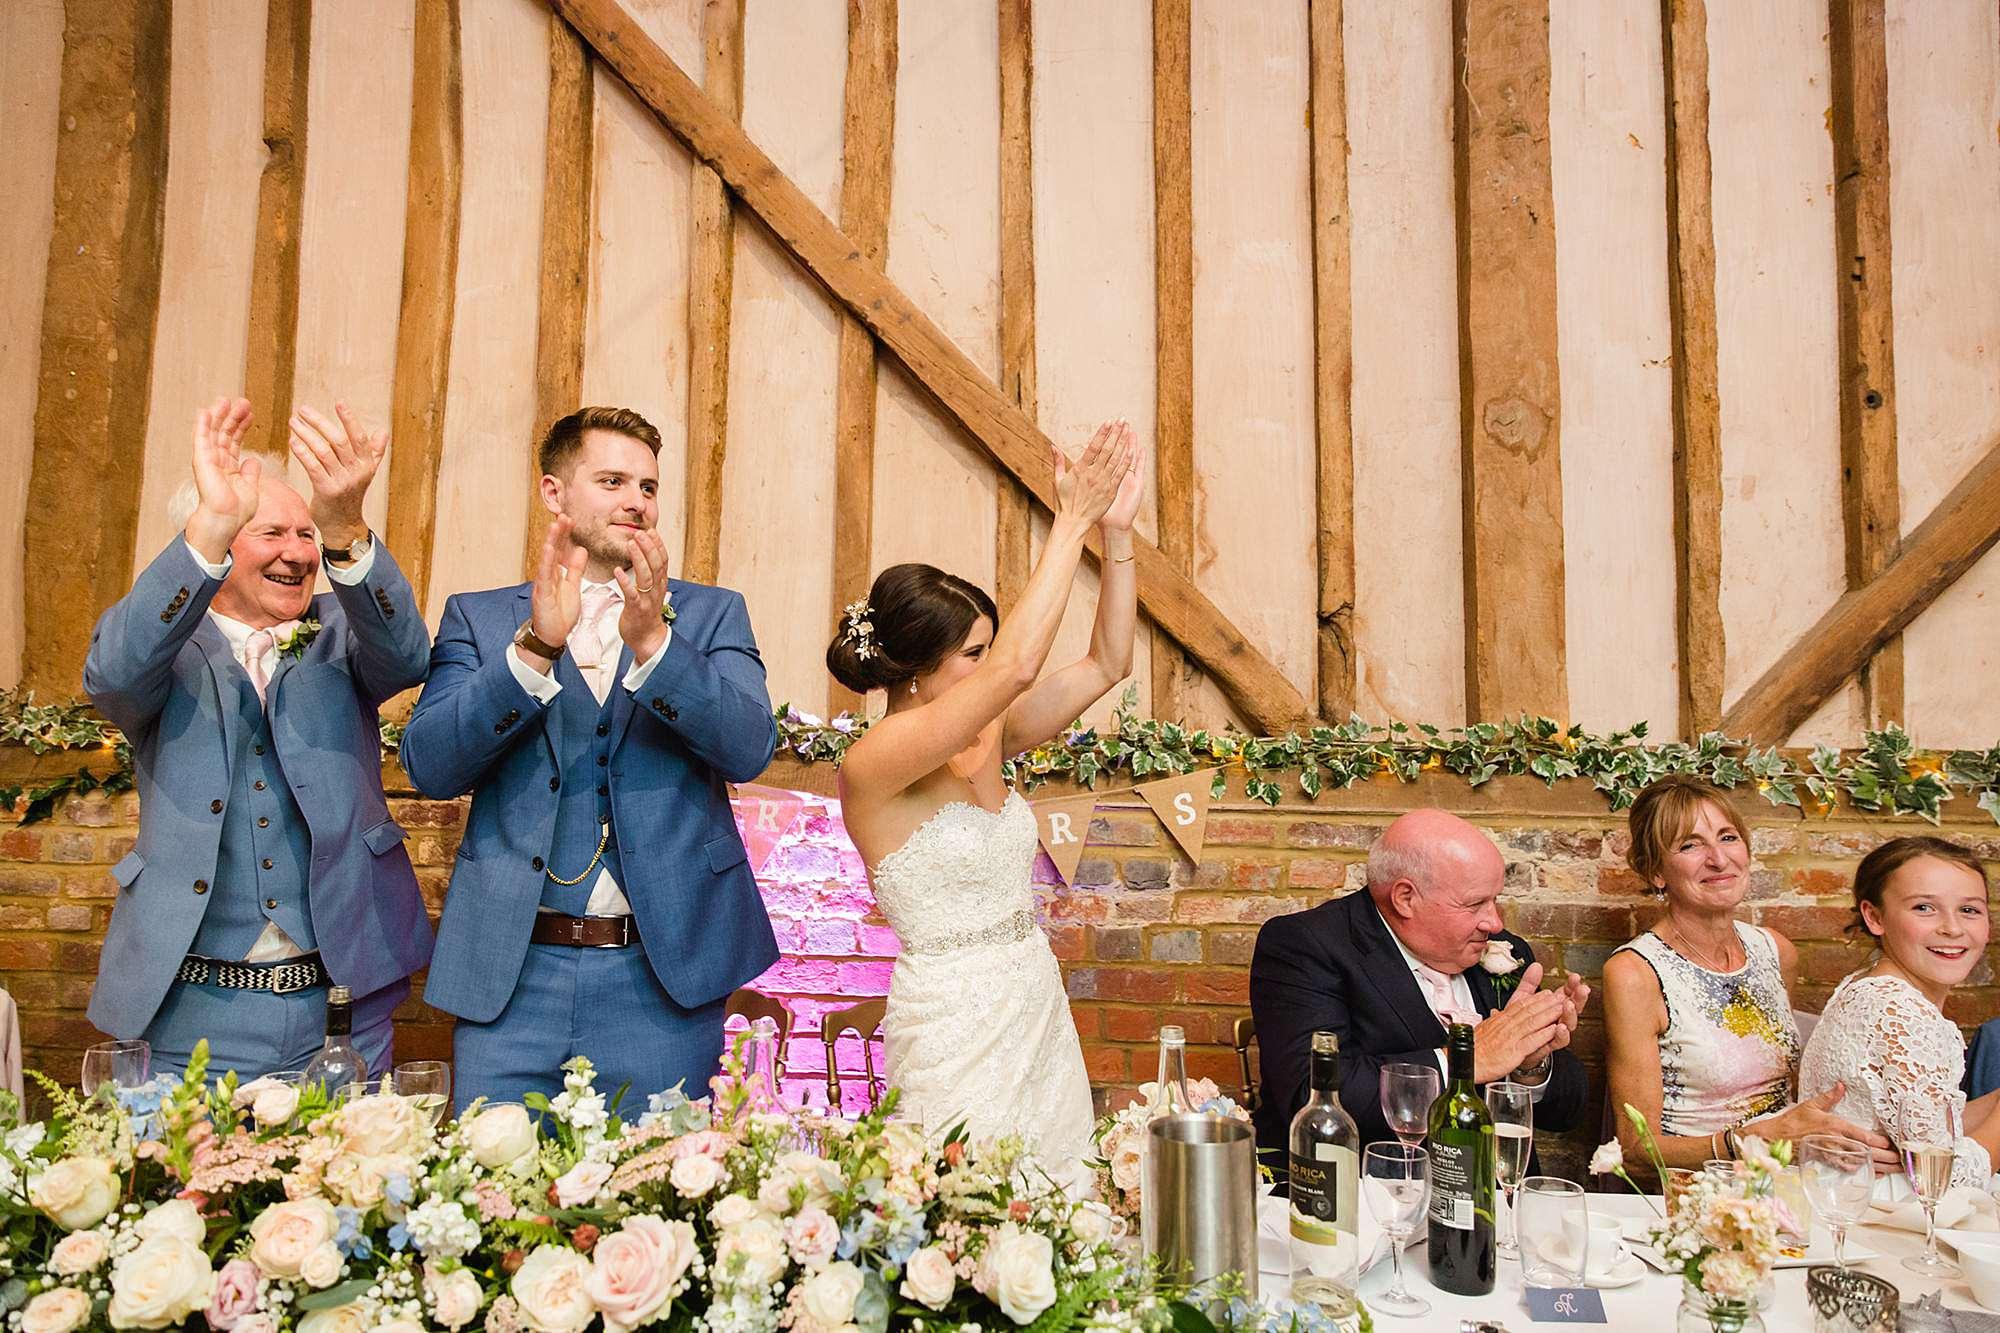 Lillibrooke Manor wedding bride and groom cheer best man